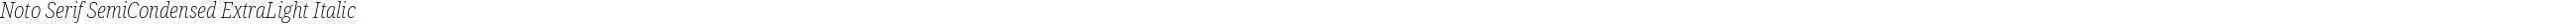 Noto Serif SemiCondensed ExtraLight Italic